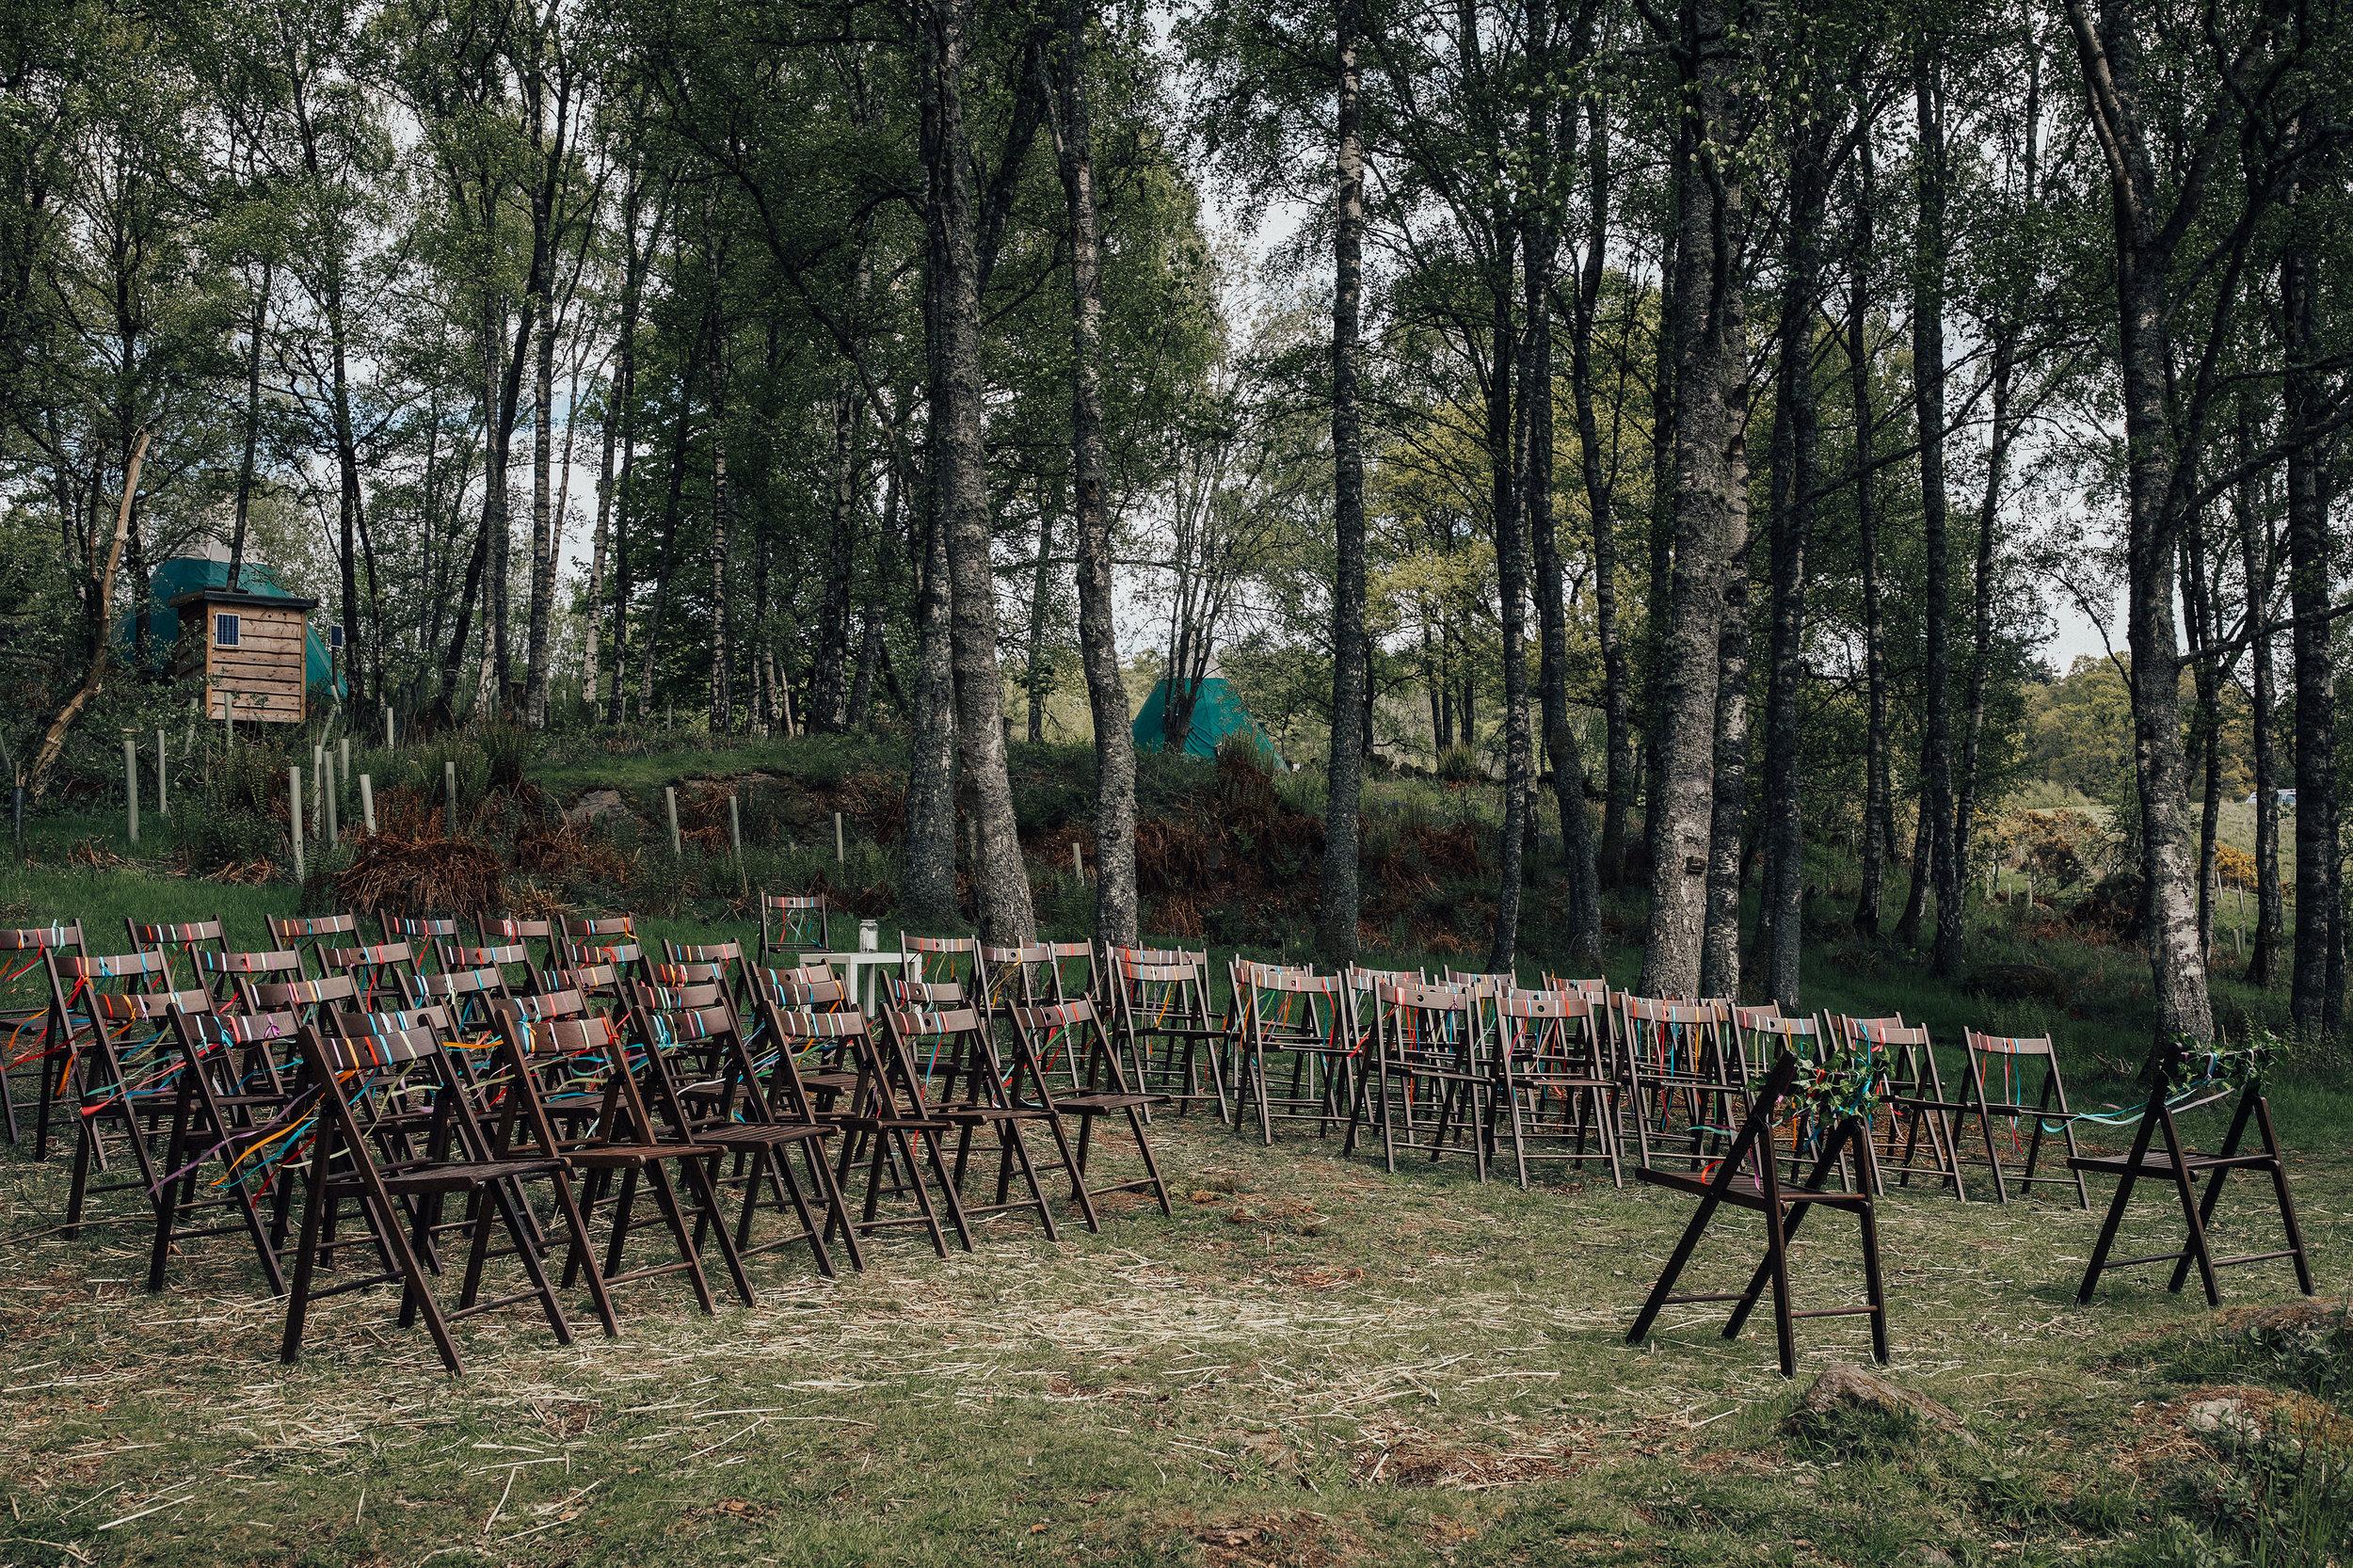 COMRIE_CROFT_WEDDINGS_PJ_PHILLIPS_PHOTOGRAPHY_15.jpg